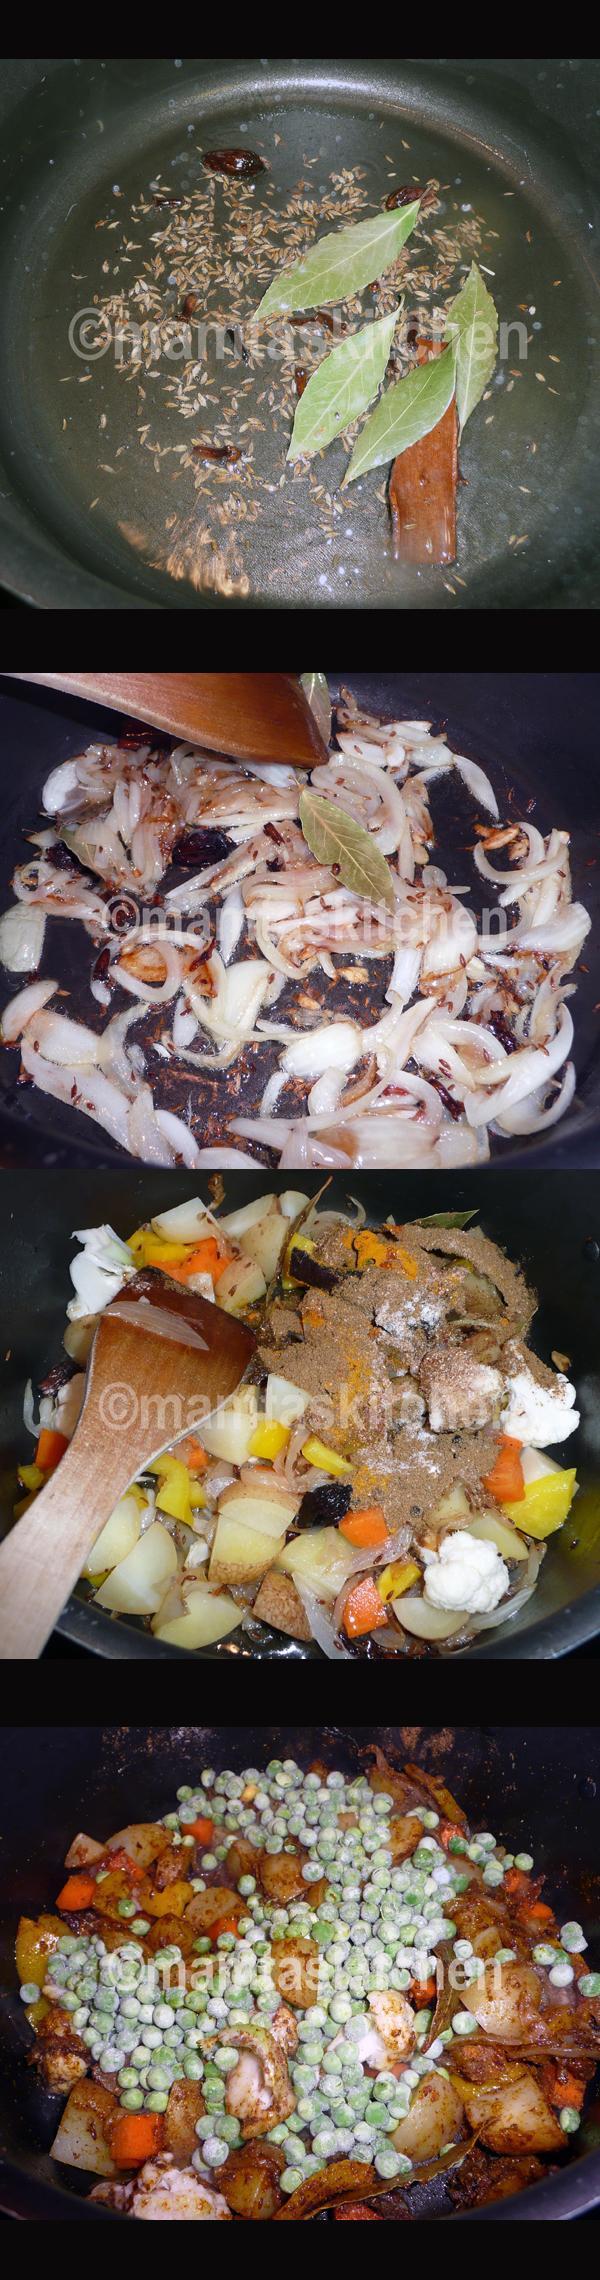 Vegetable Biryani Rice1, With Paneer Cheese